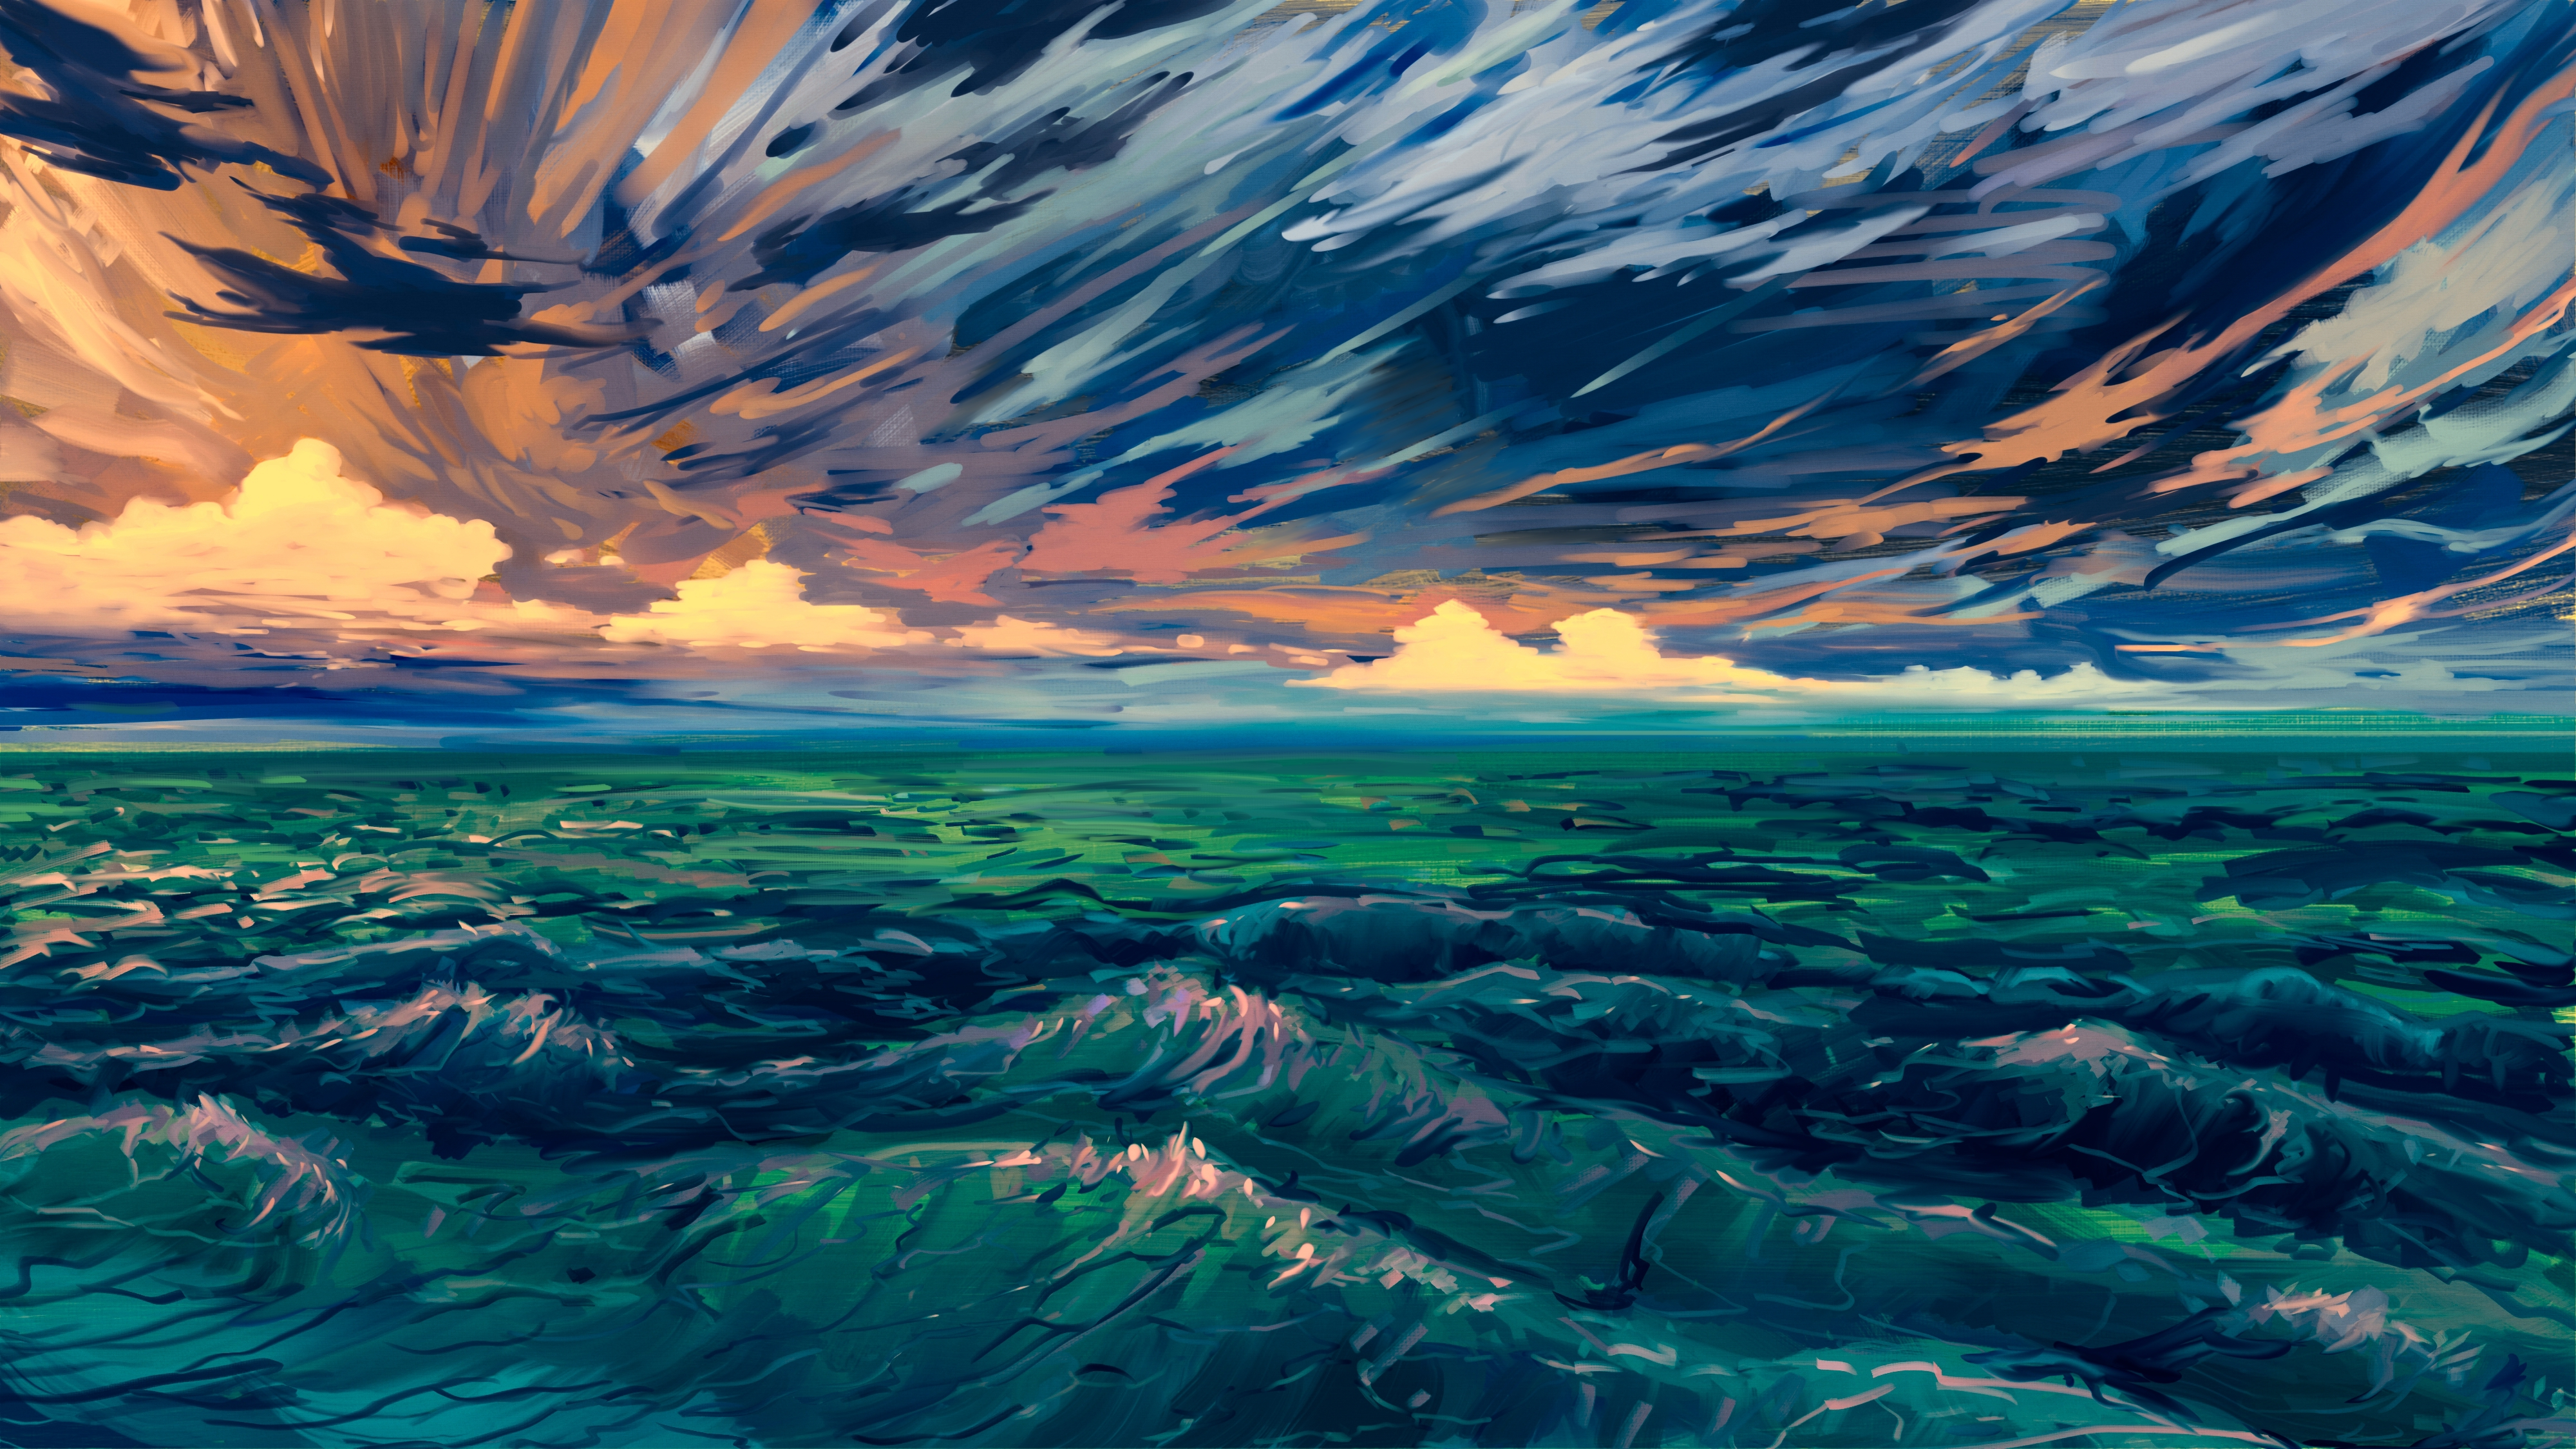 General 4000x2250 digital art digital painting sea Hangmoon sky sunlight water waves clouds nature outdoors DeviantArt